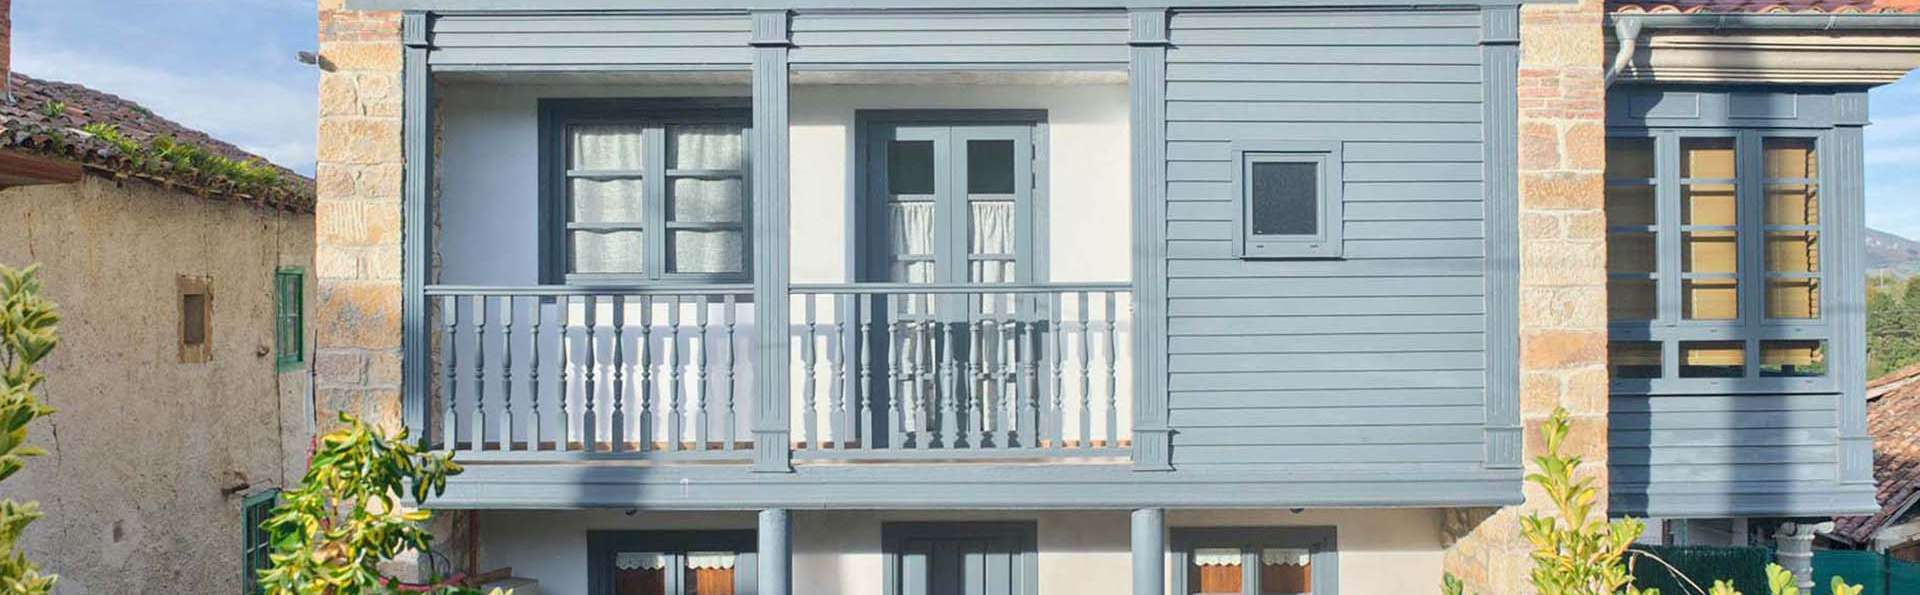 Apartamentos La Llongar Piloña - EDIT_FACHADA_CORREDOR_LA_LLONGAR_01.jpg